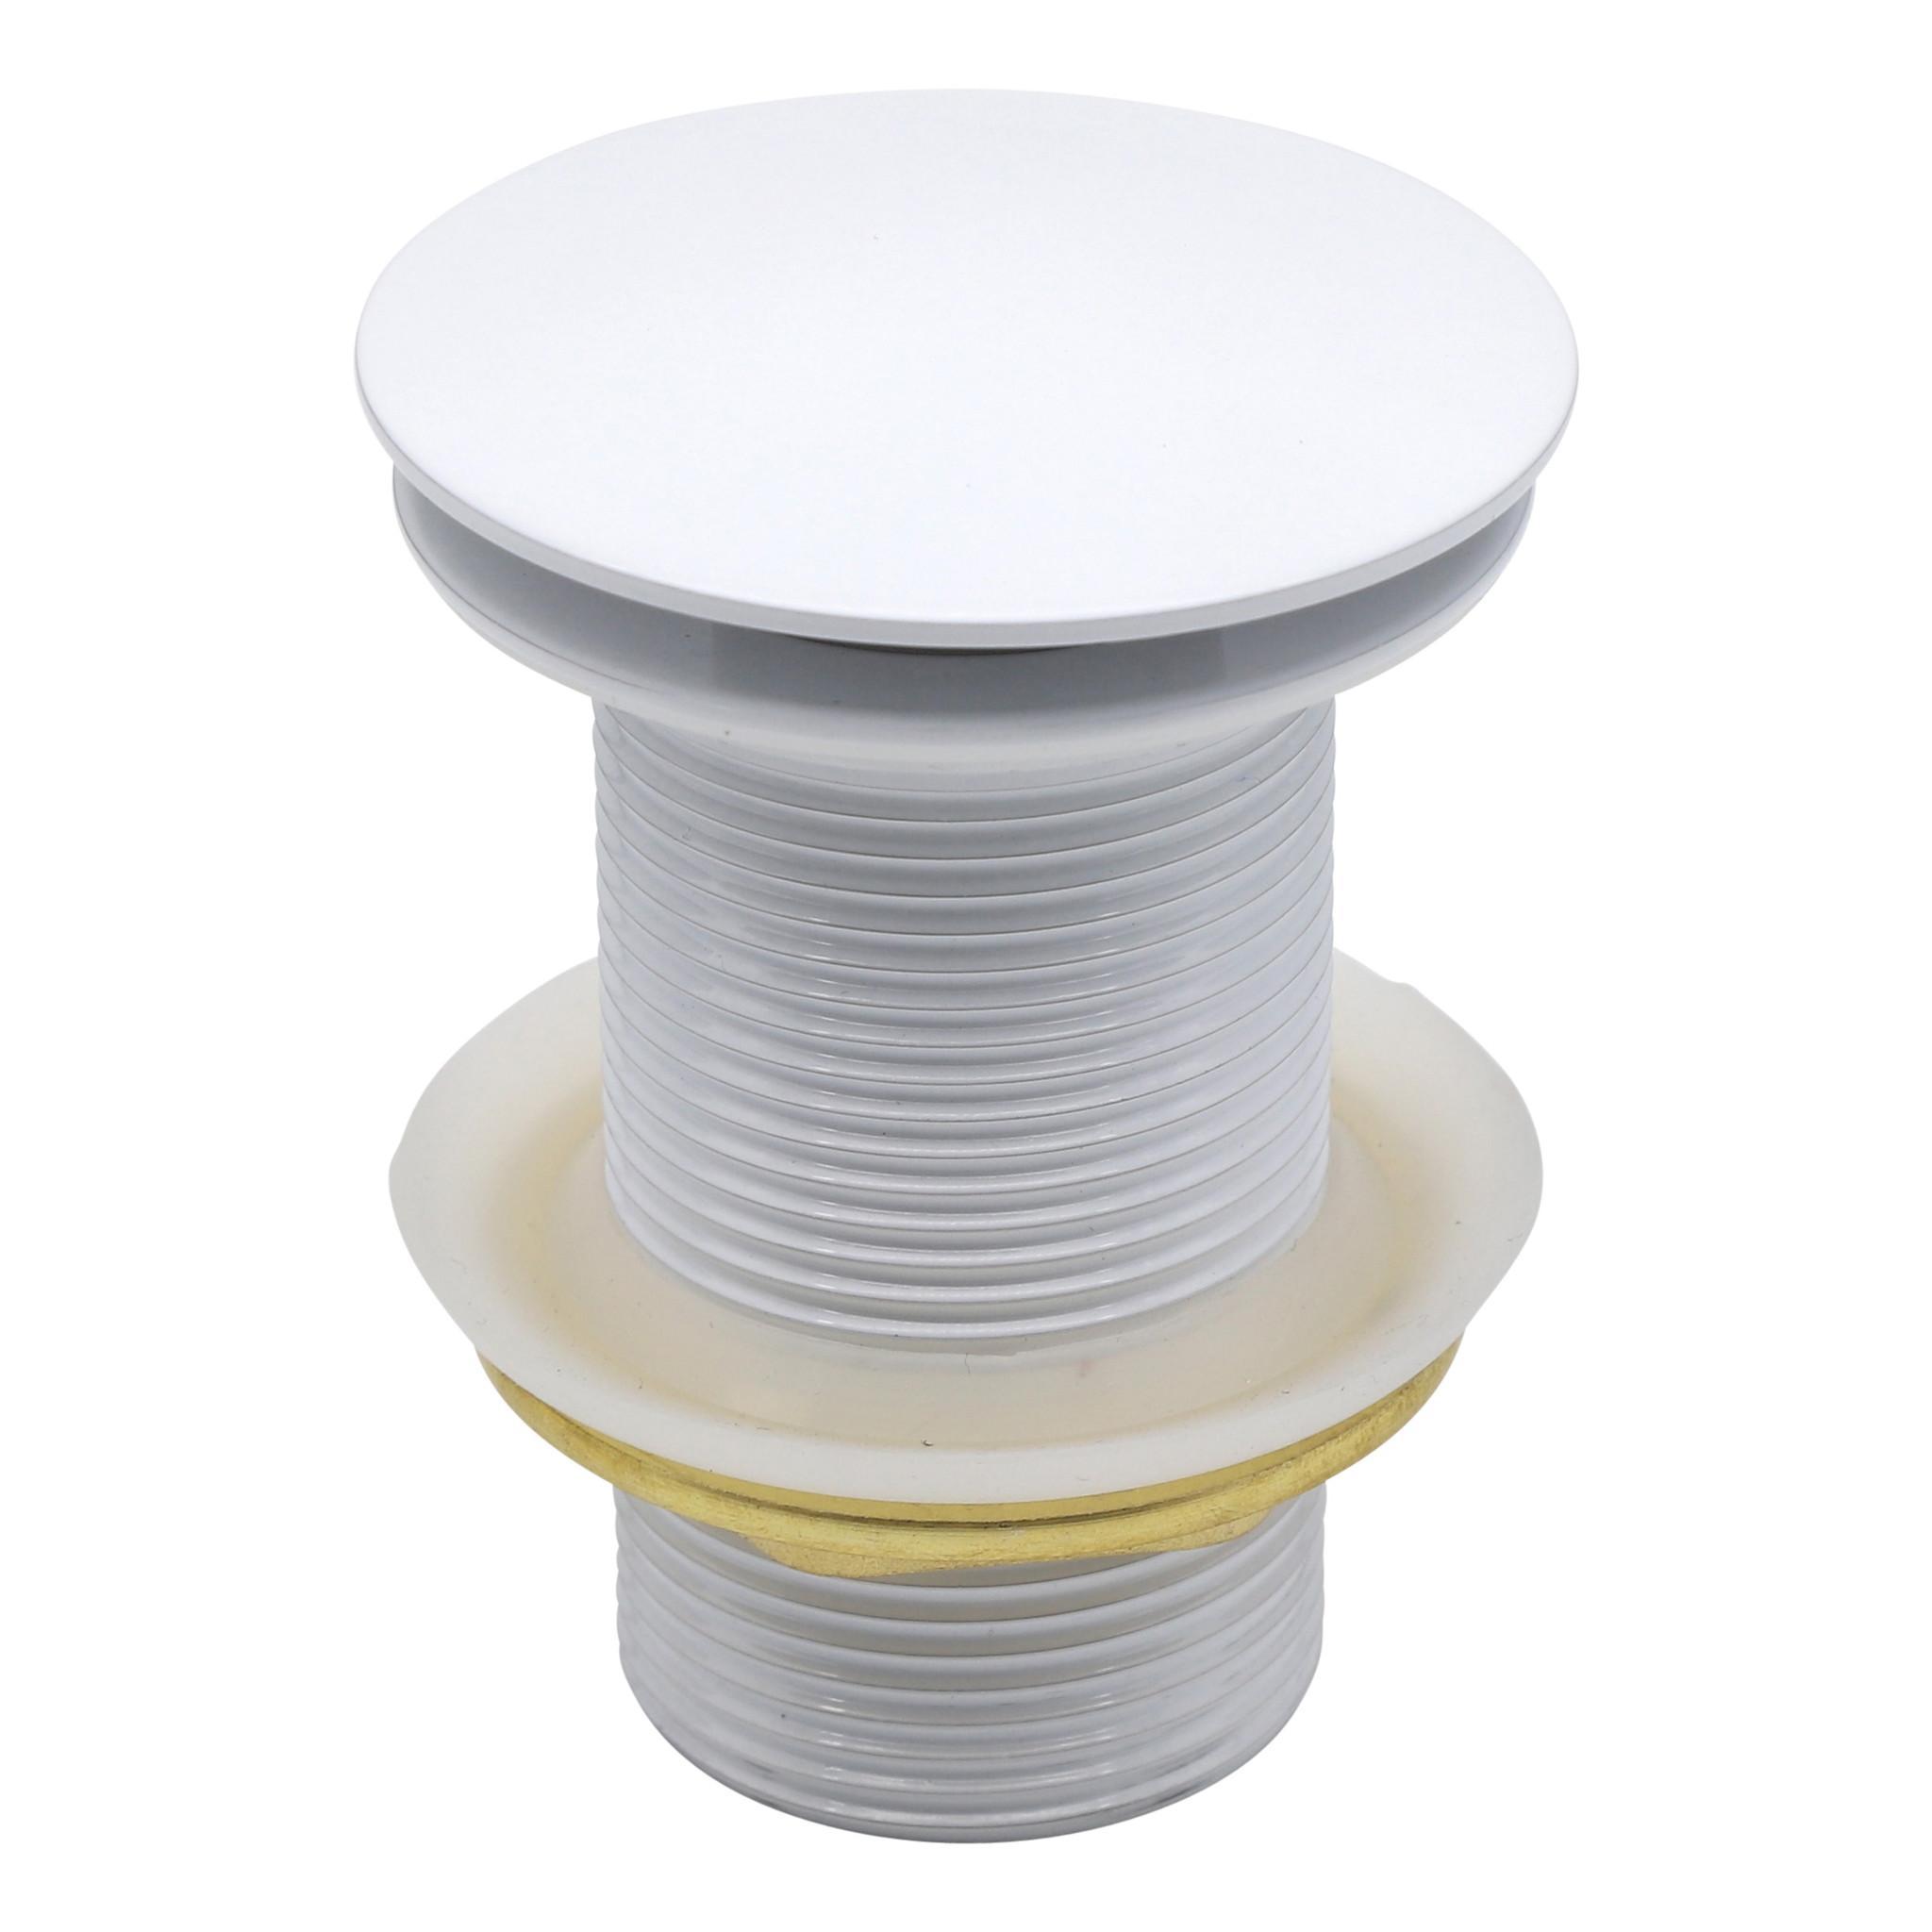 Indomarmer Pop-up Drain Plug with Long Shaft 9 cm White